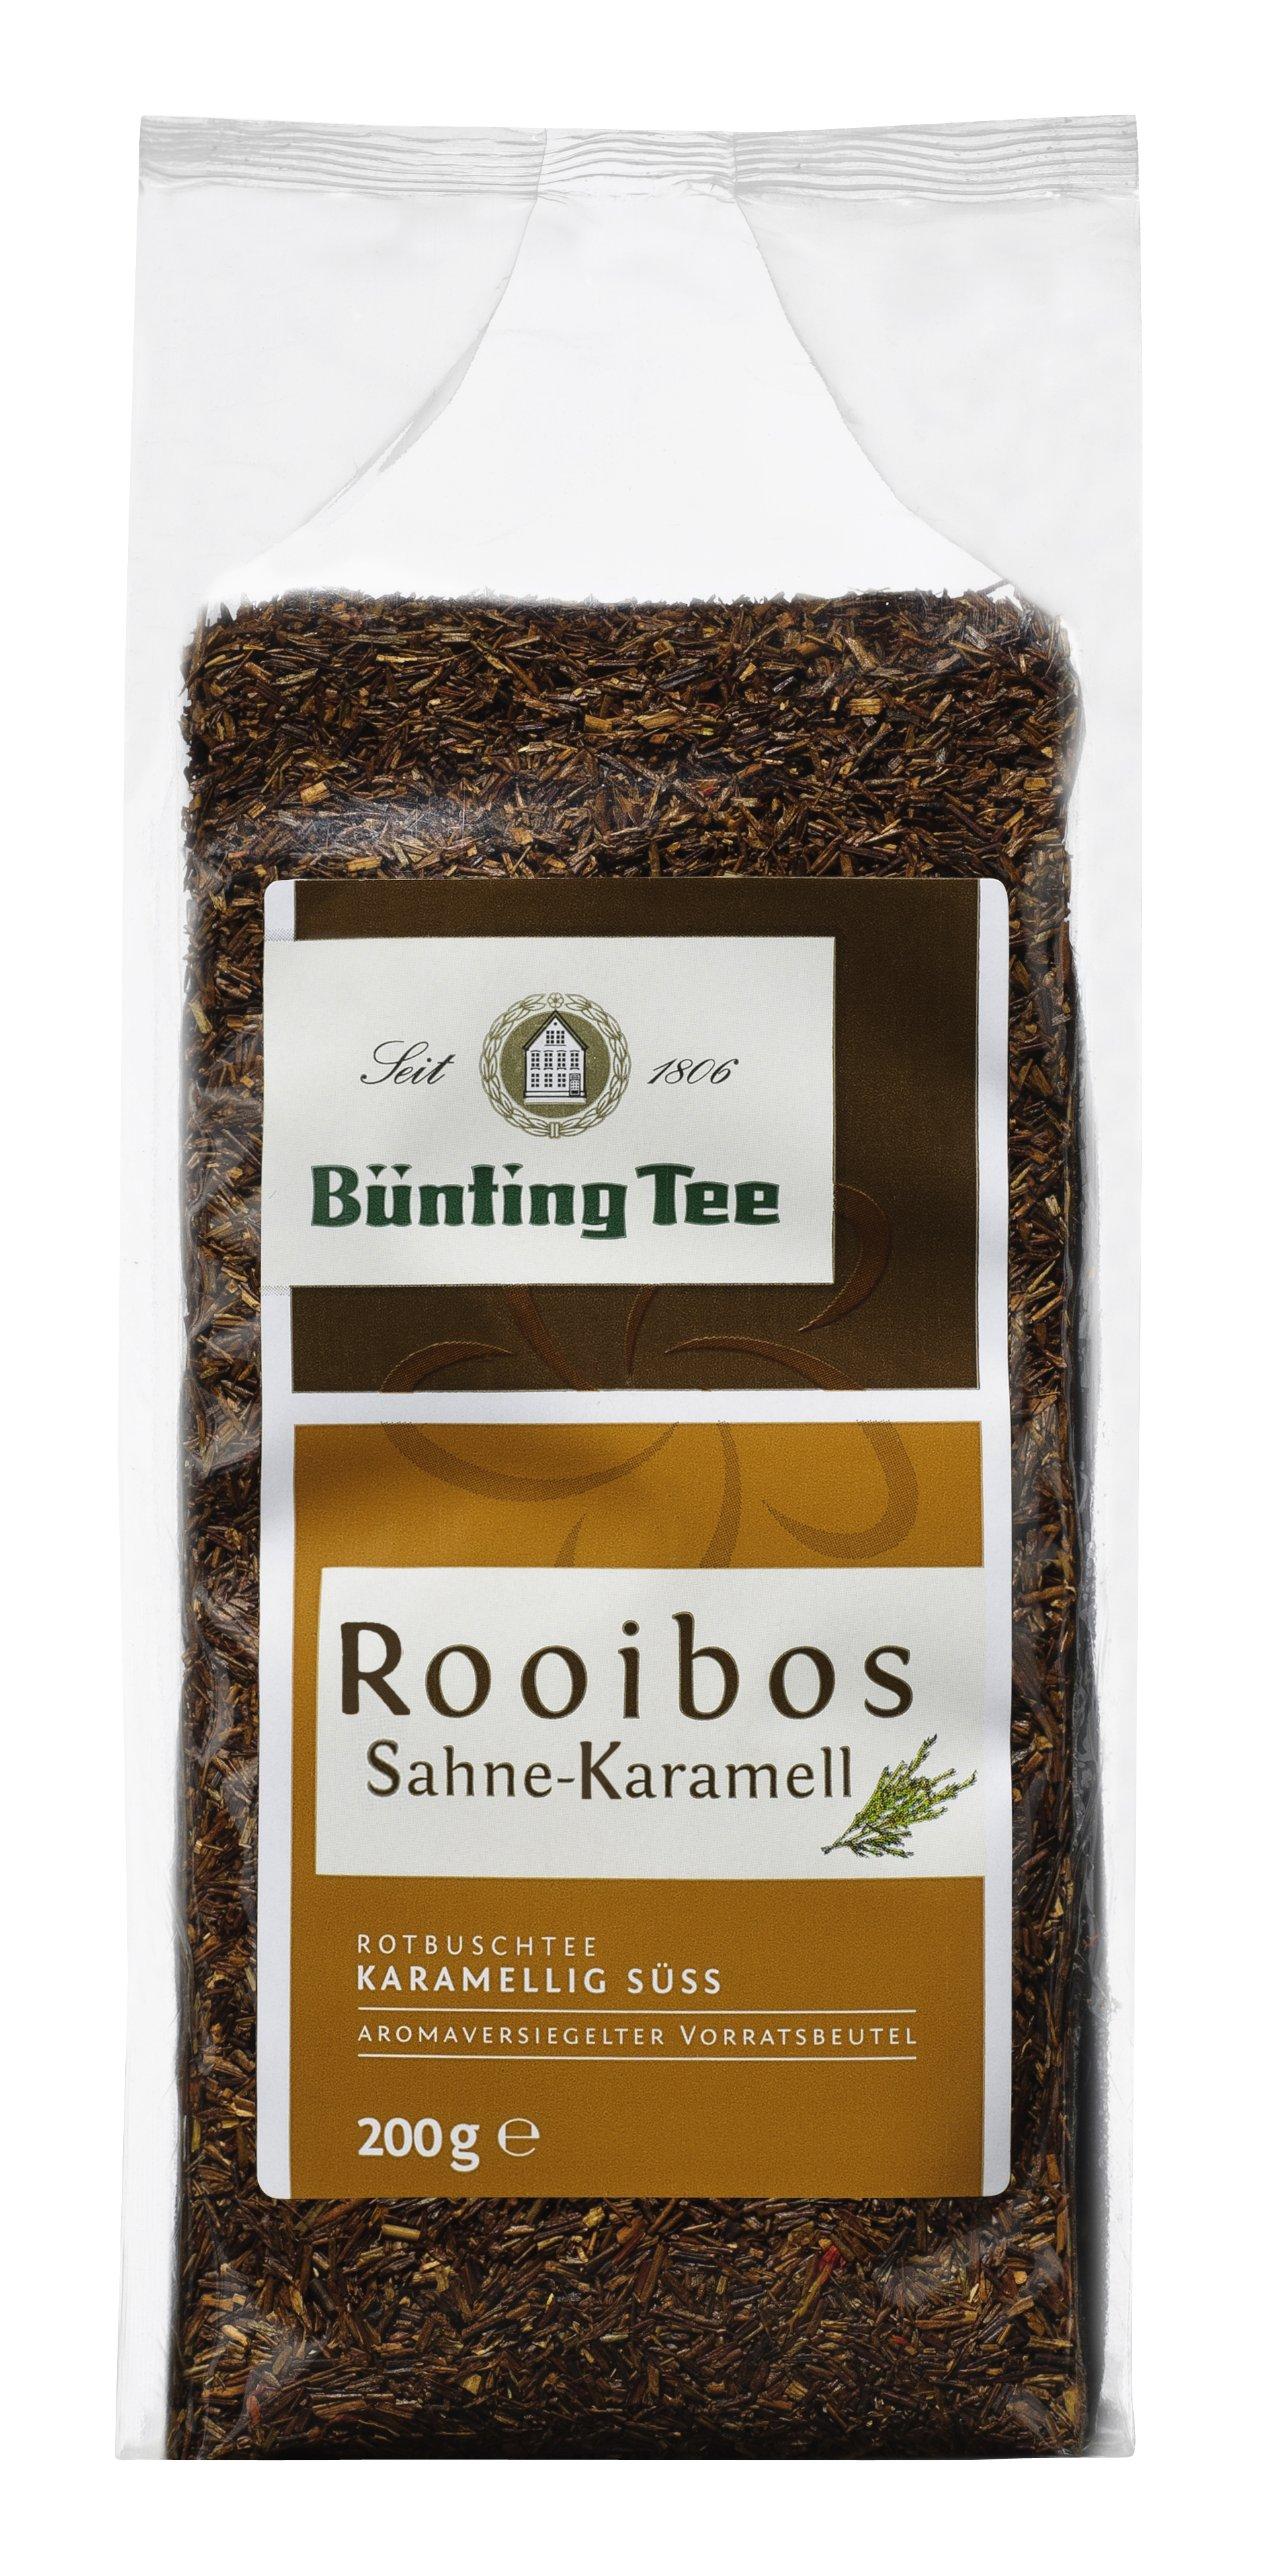 Bnting-Tee-Rooibos-Sahne-Karamell-200g